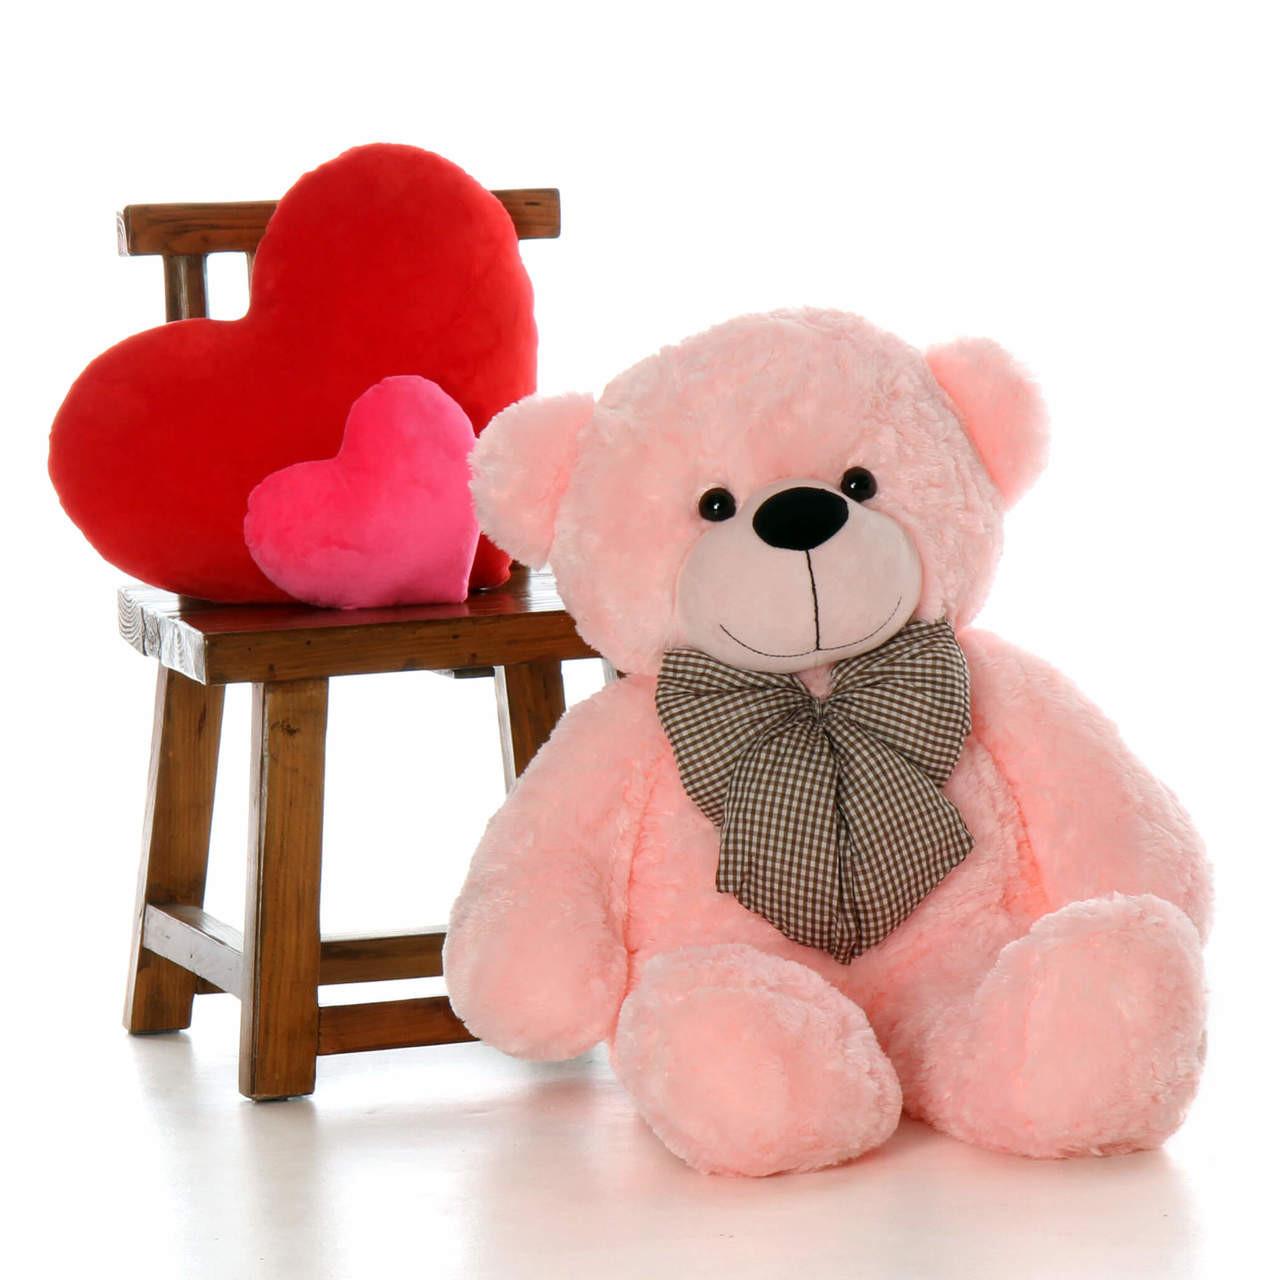 Lady Cuddles 38in  Super Soft Huggable, Pink Plush Bear